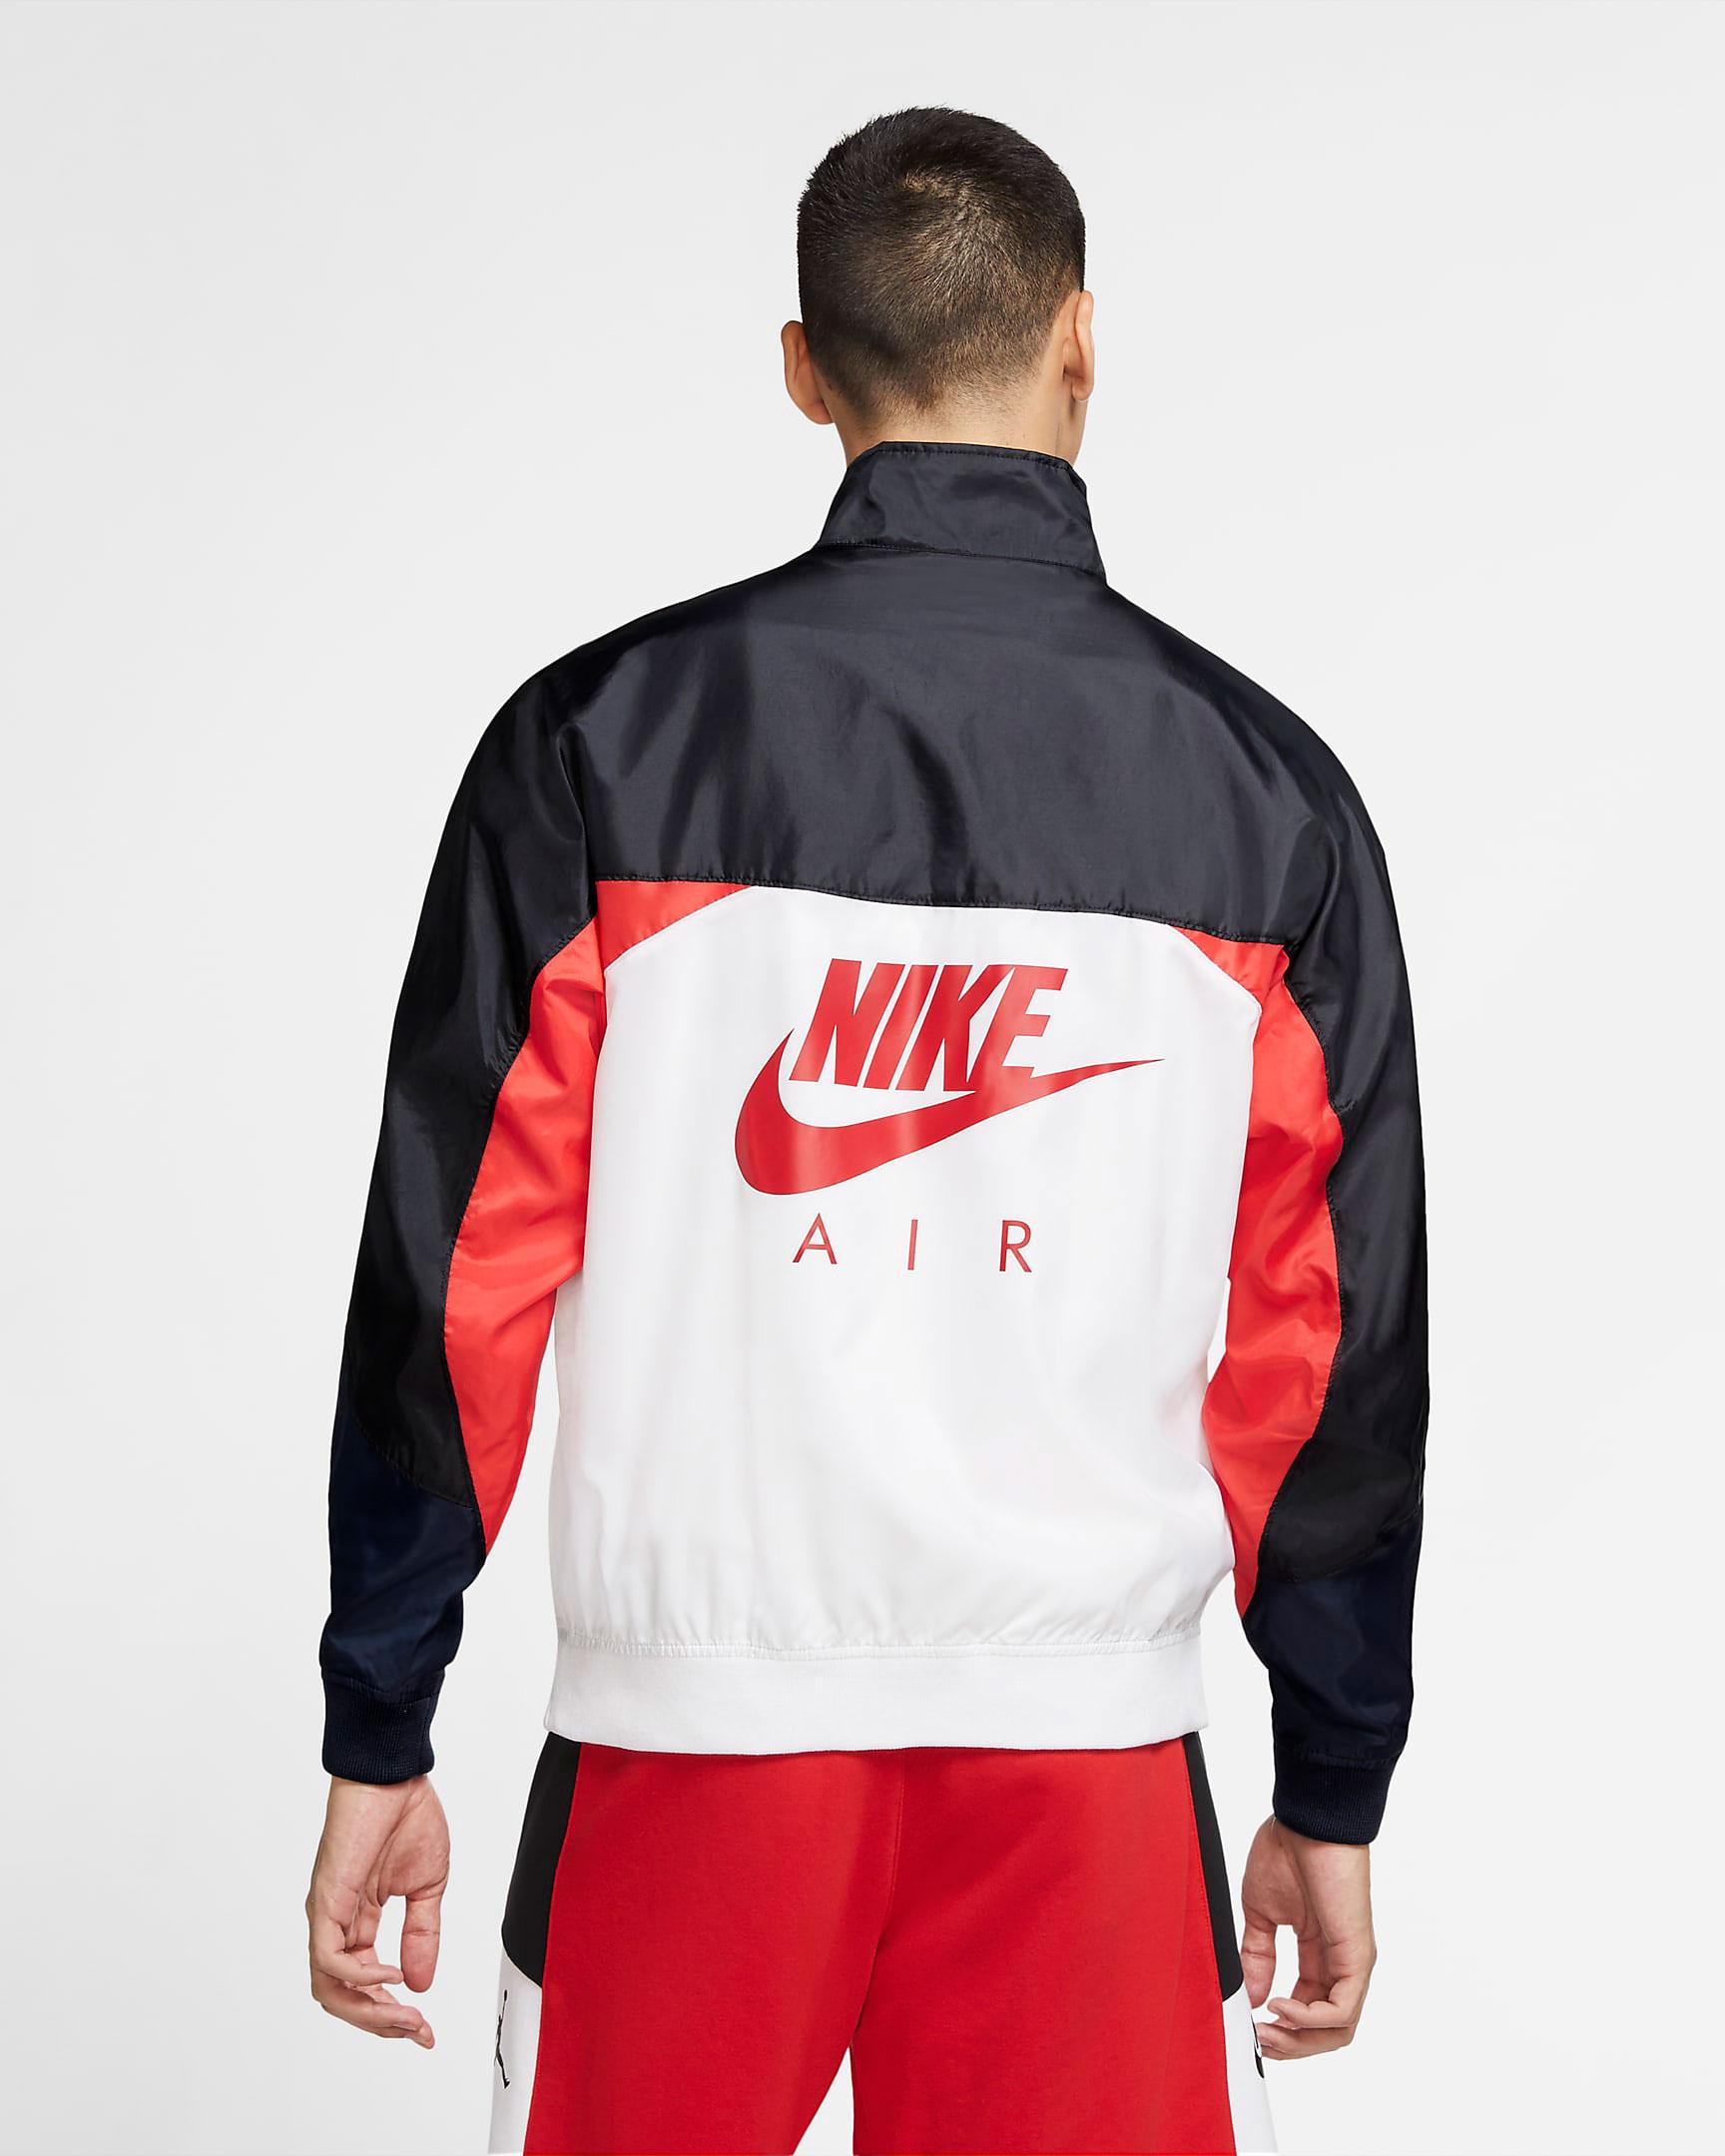 air-jordan-3-denim-fire-red-jacket-2